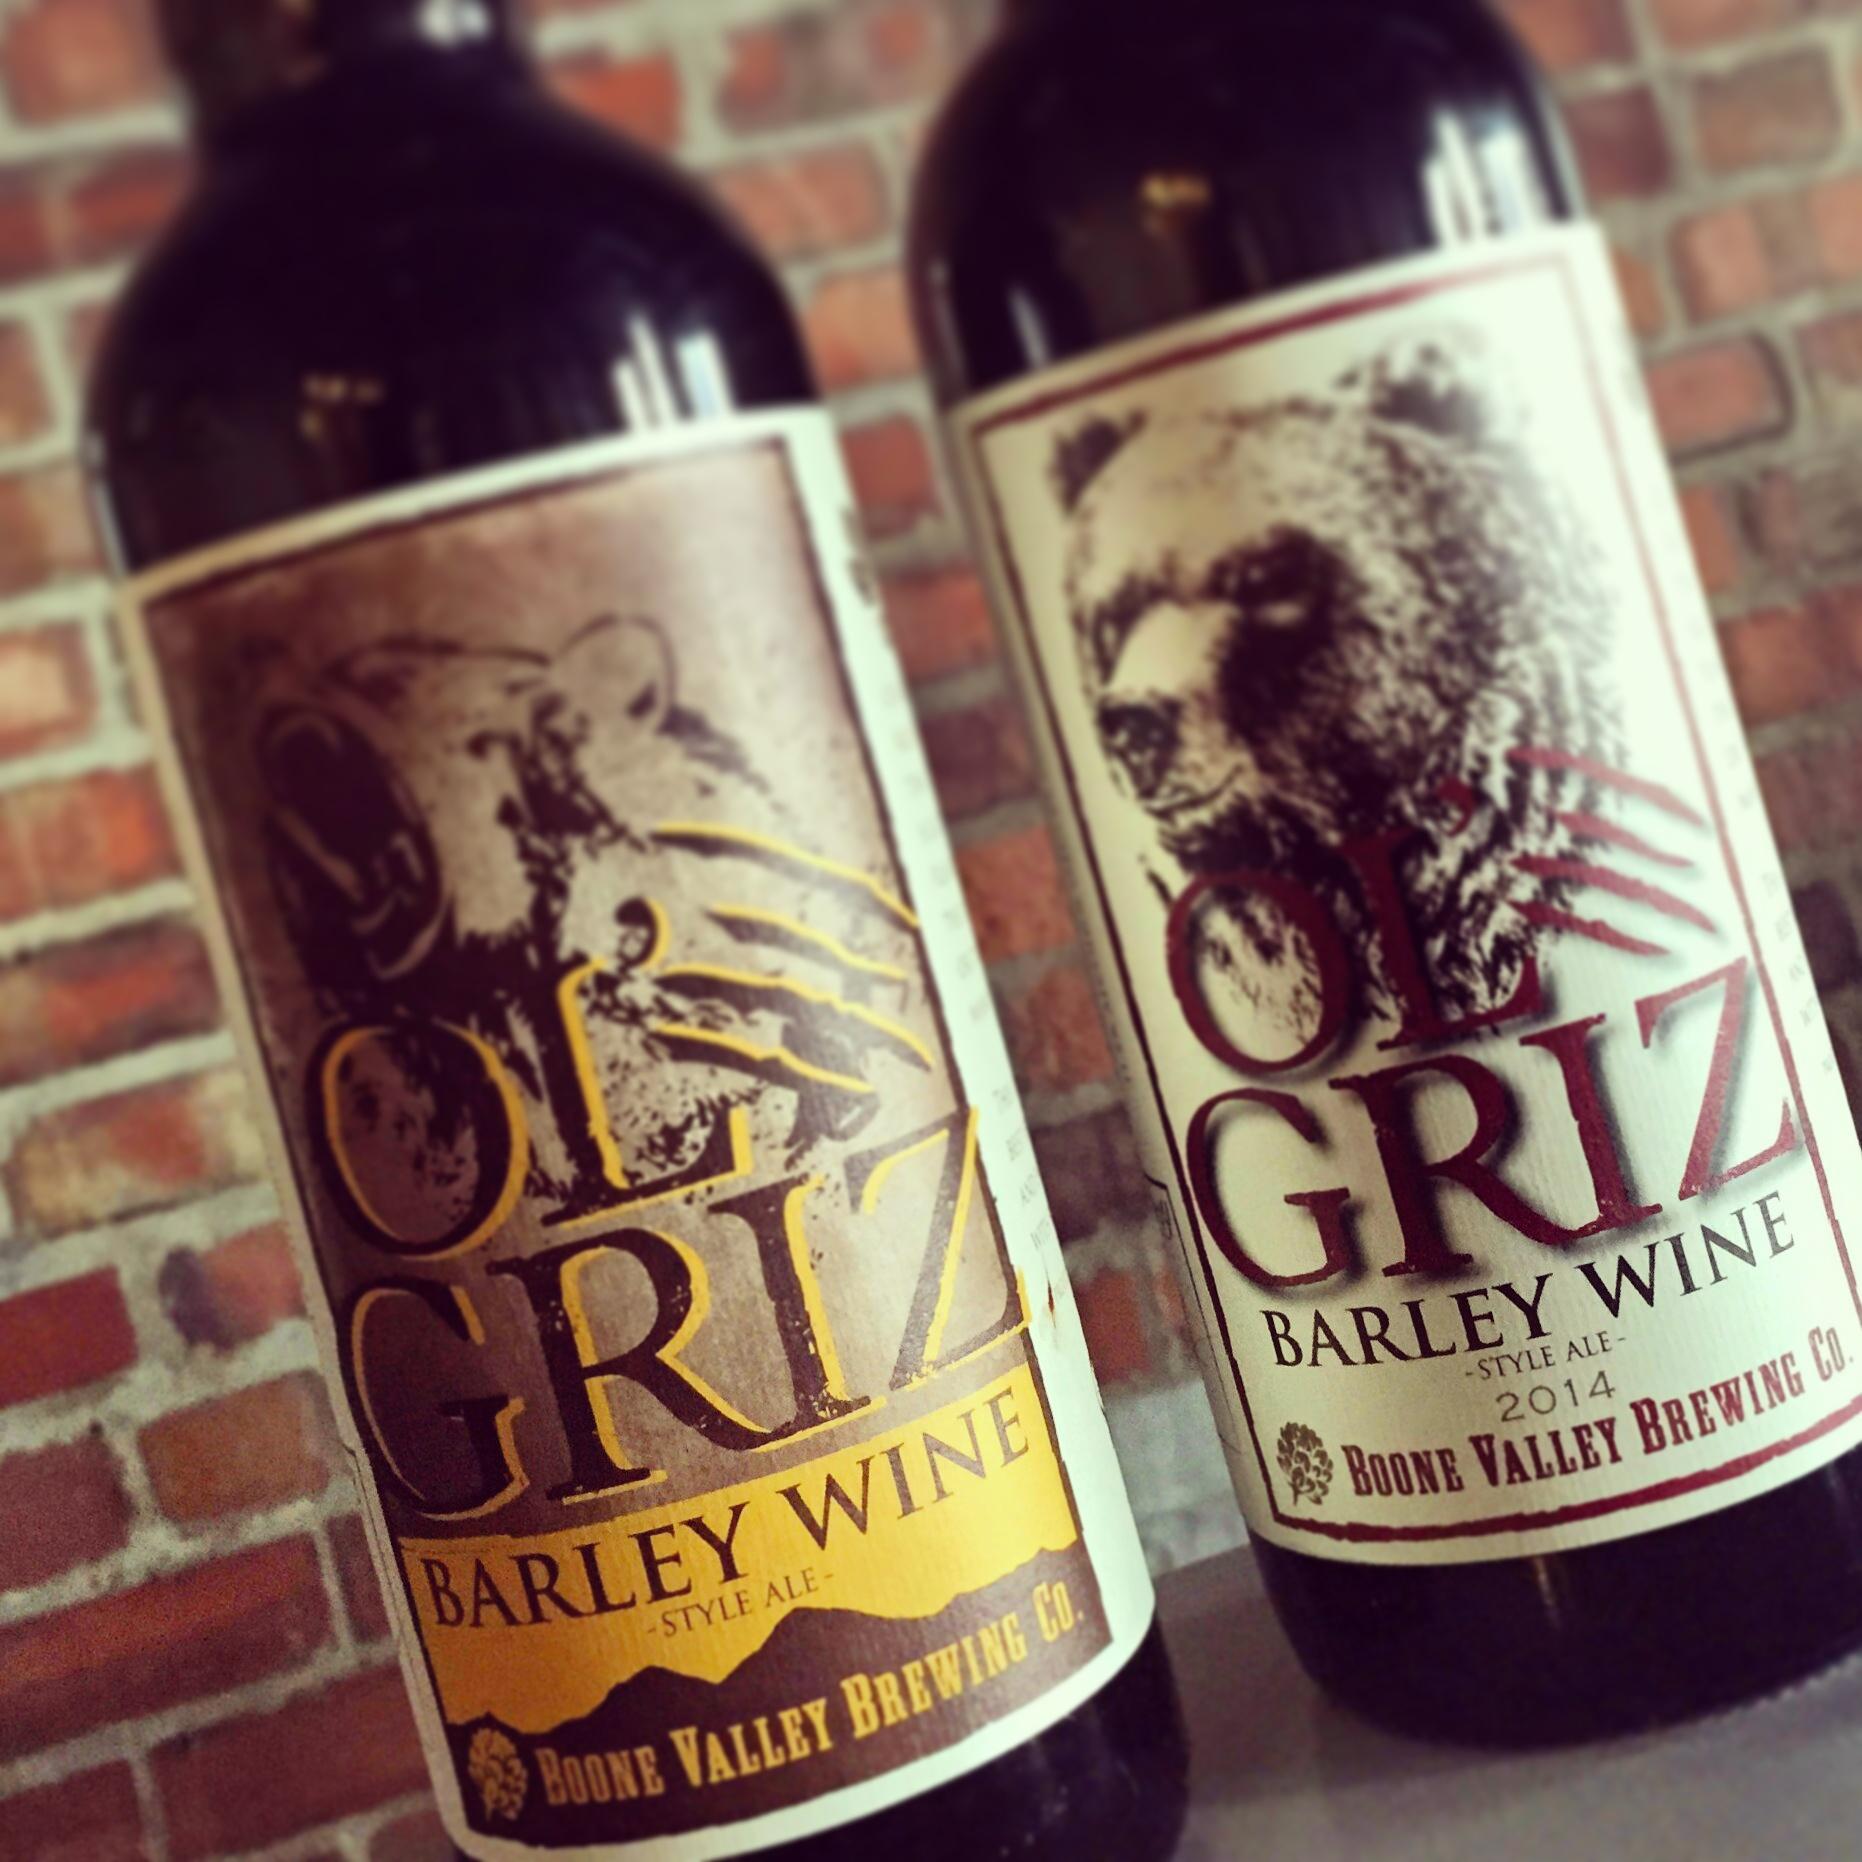 Beer 22oz bottle of 2014 Olu0027 Griz Barleywine - 11.5% ABV 22oz bottle of 2013 Olu0027 Griz Barleywine - 11.5% ABV Barleywine Style Ale thick and full bodied ... & Iowa Craft Beer Tent